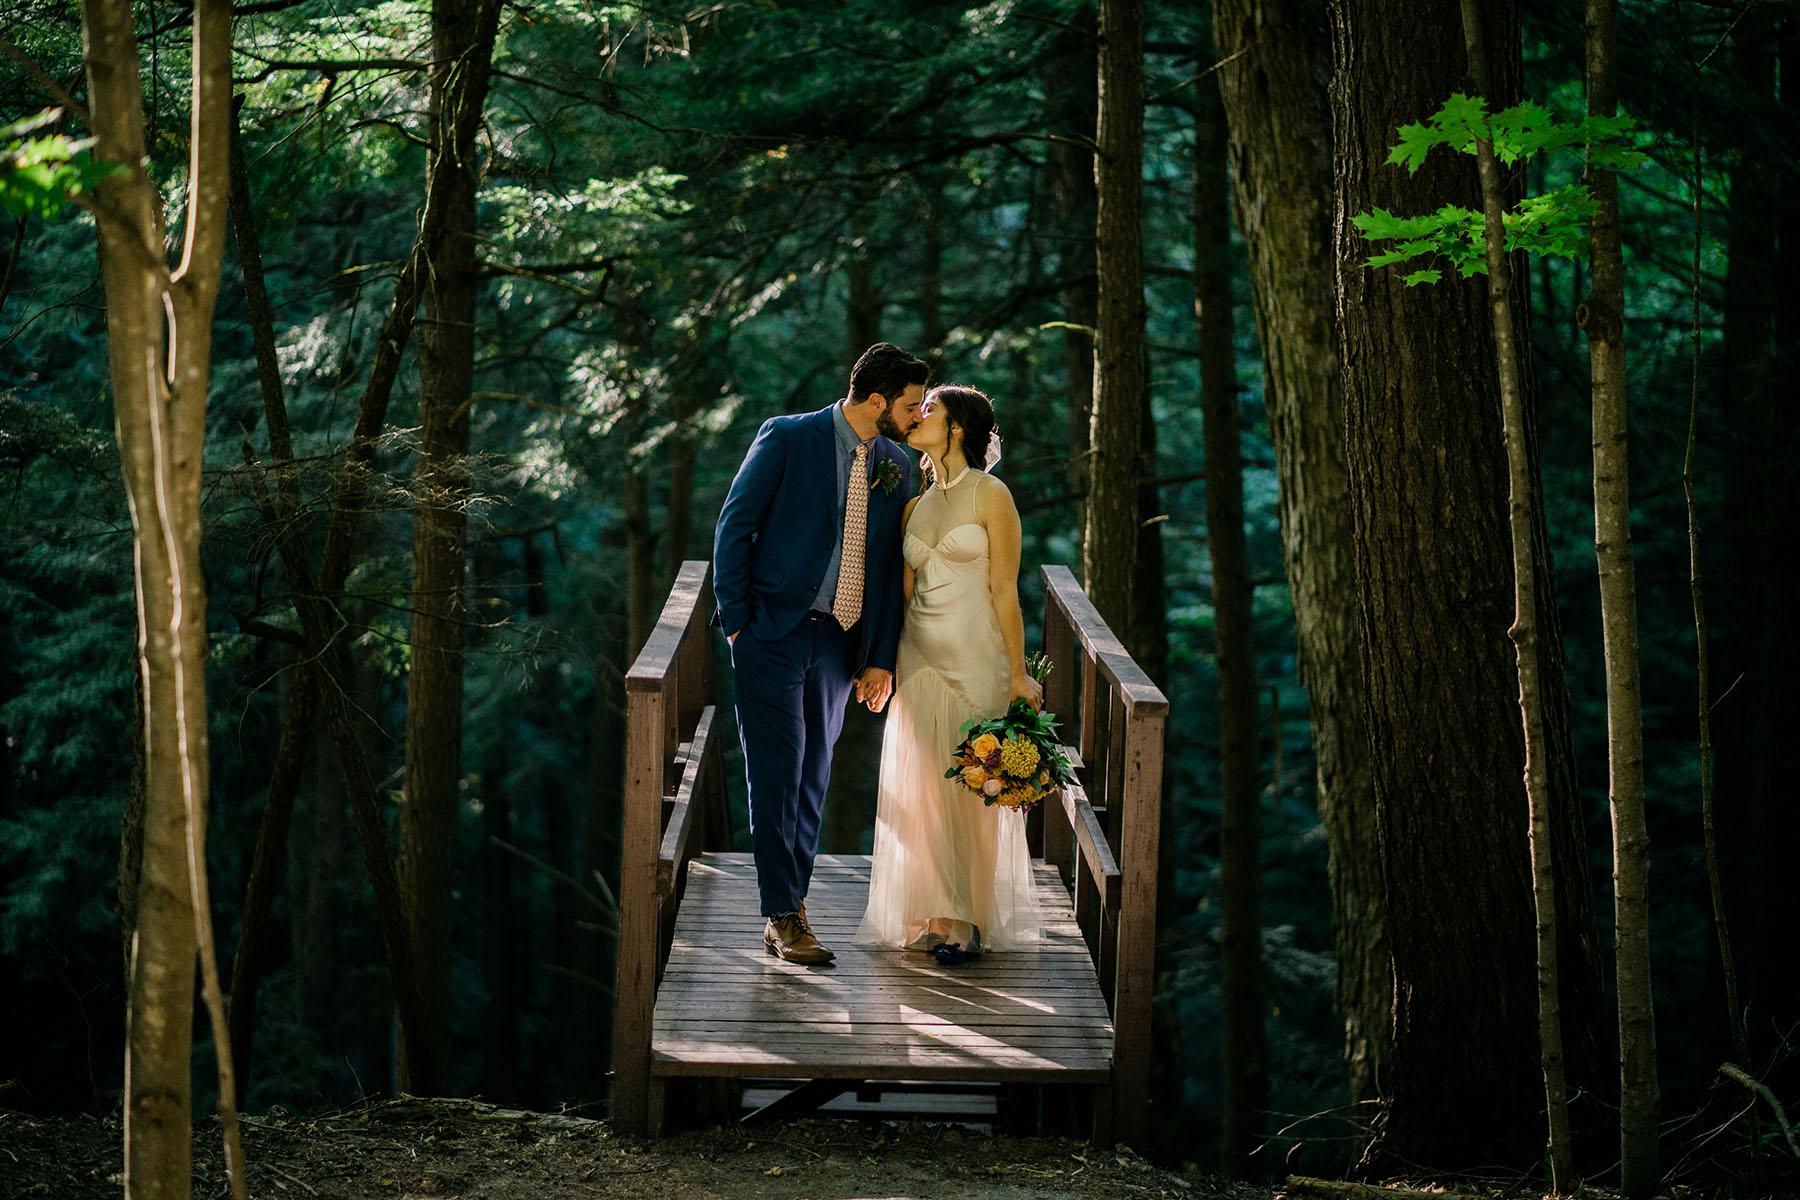 Wedding at the Ganaraska forest